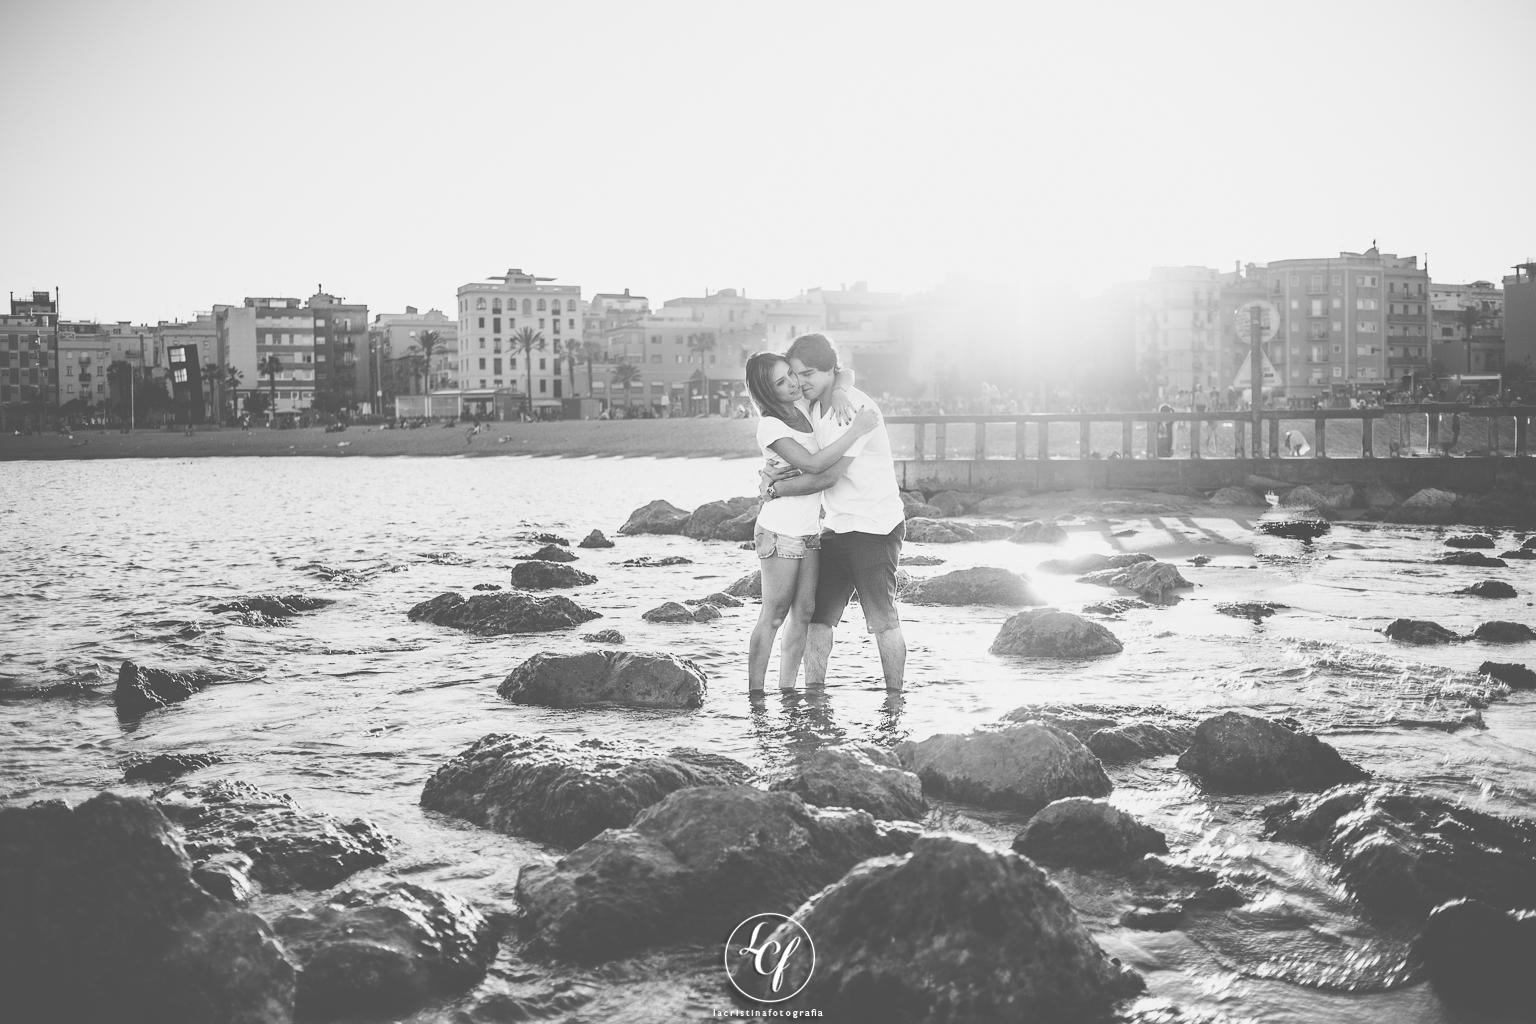 fotógrafo pareja barcelona :: fotografía de pareja barcelona ::: fotógrafo preboda Barcelona :: fotógrafo turismo barcelona